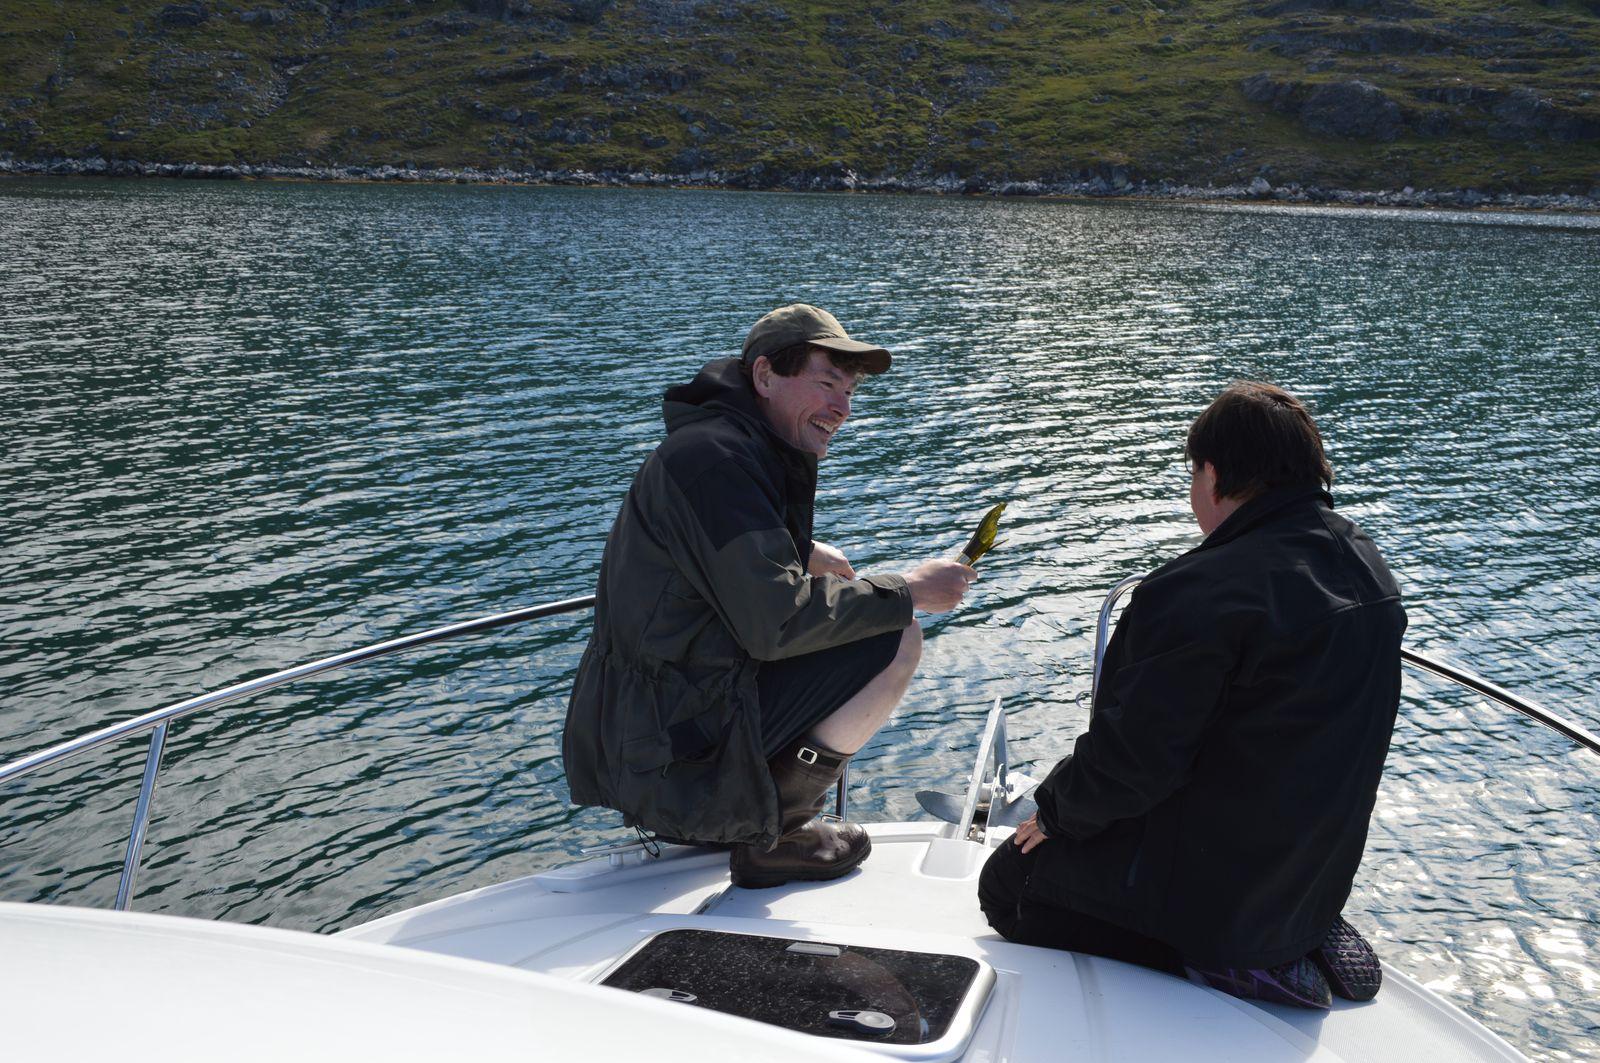 Maru døbes i champagne